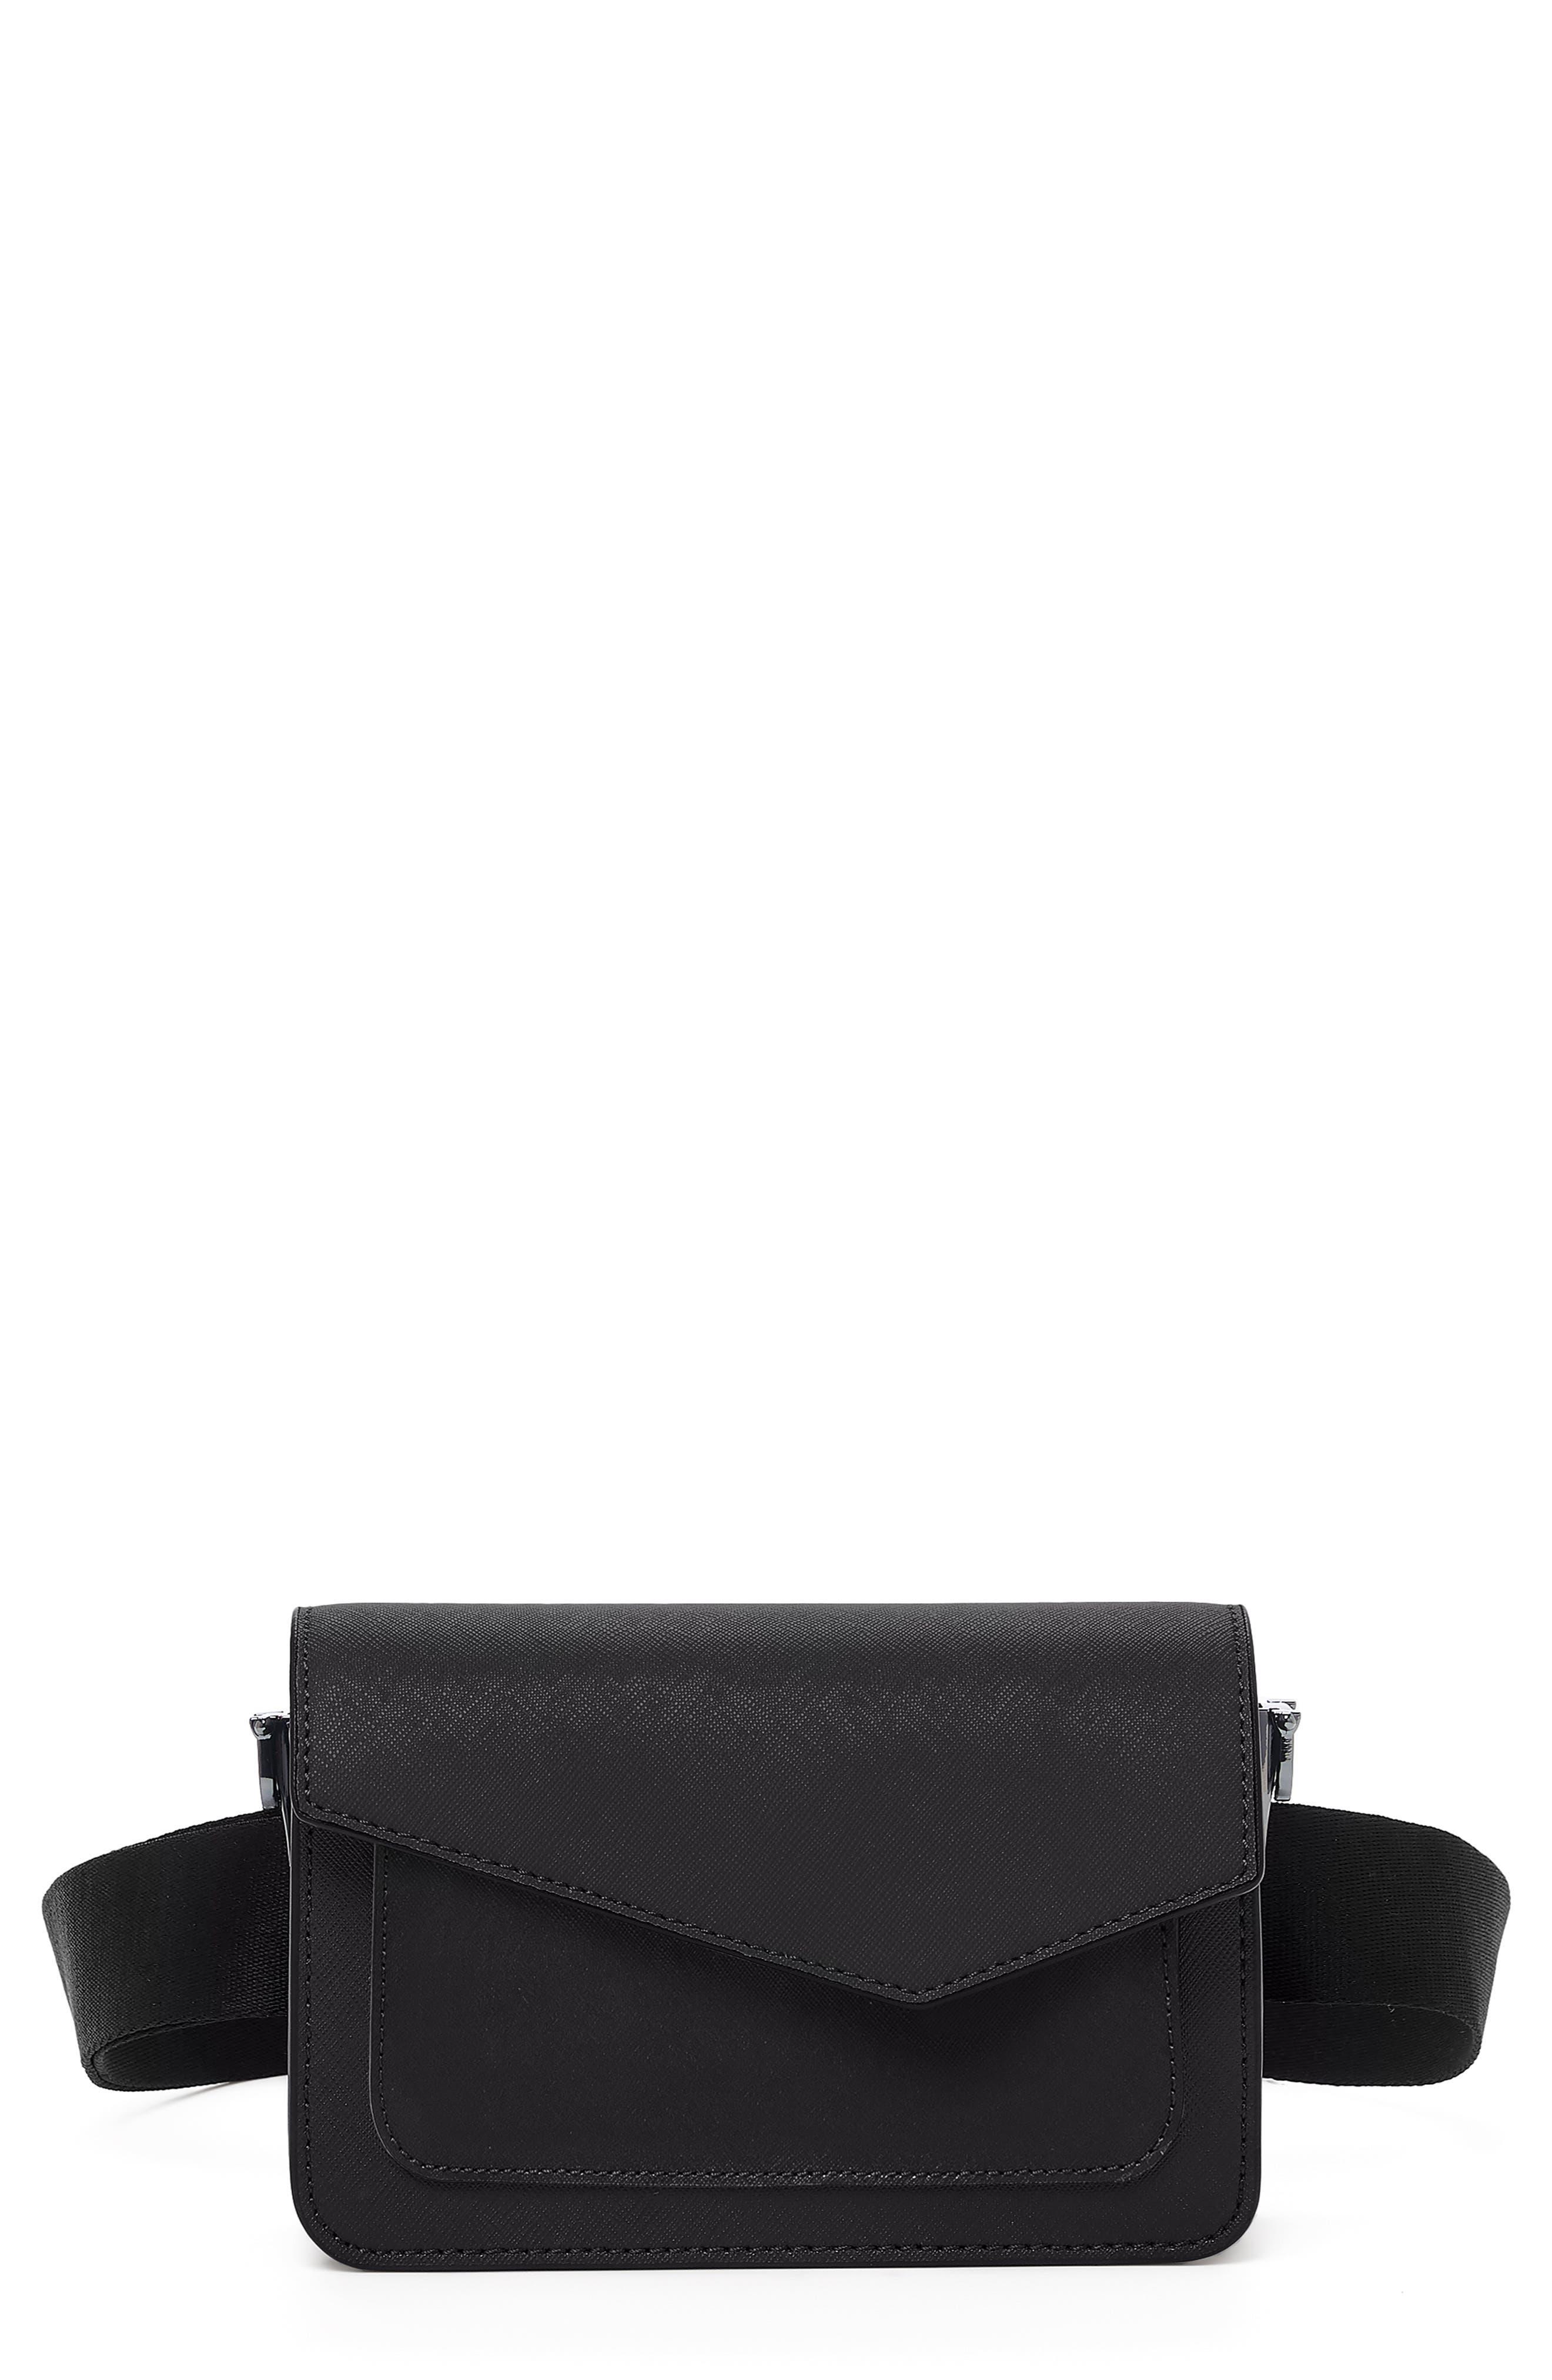 Cobble Hill Leather Convertible Belt Bag,                             Main thumbnail 1, color,                             BLACK